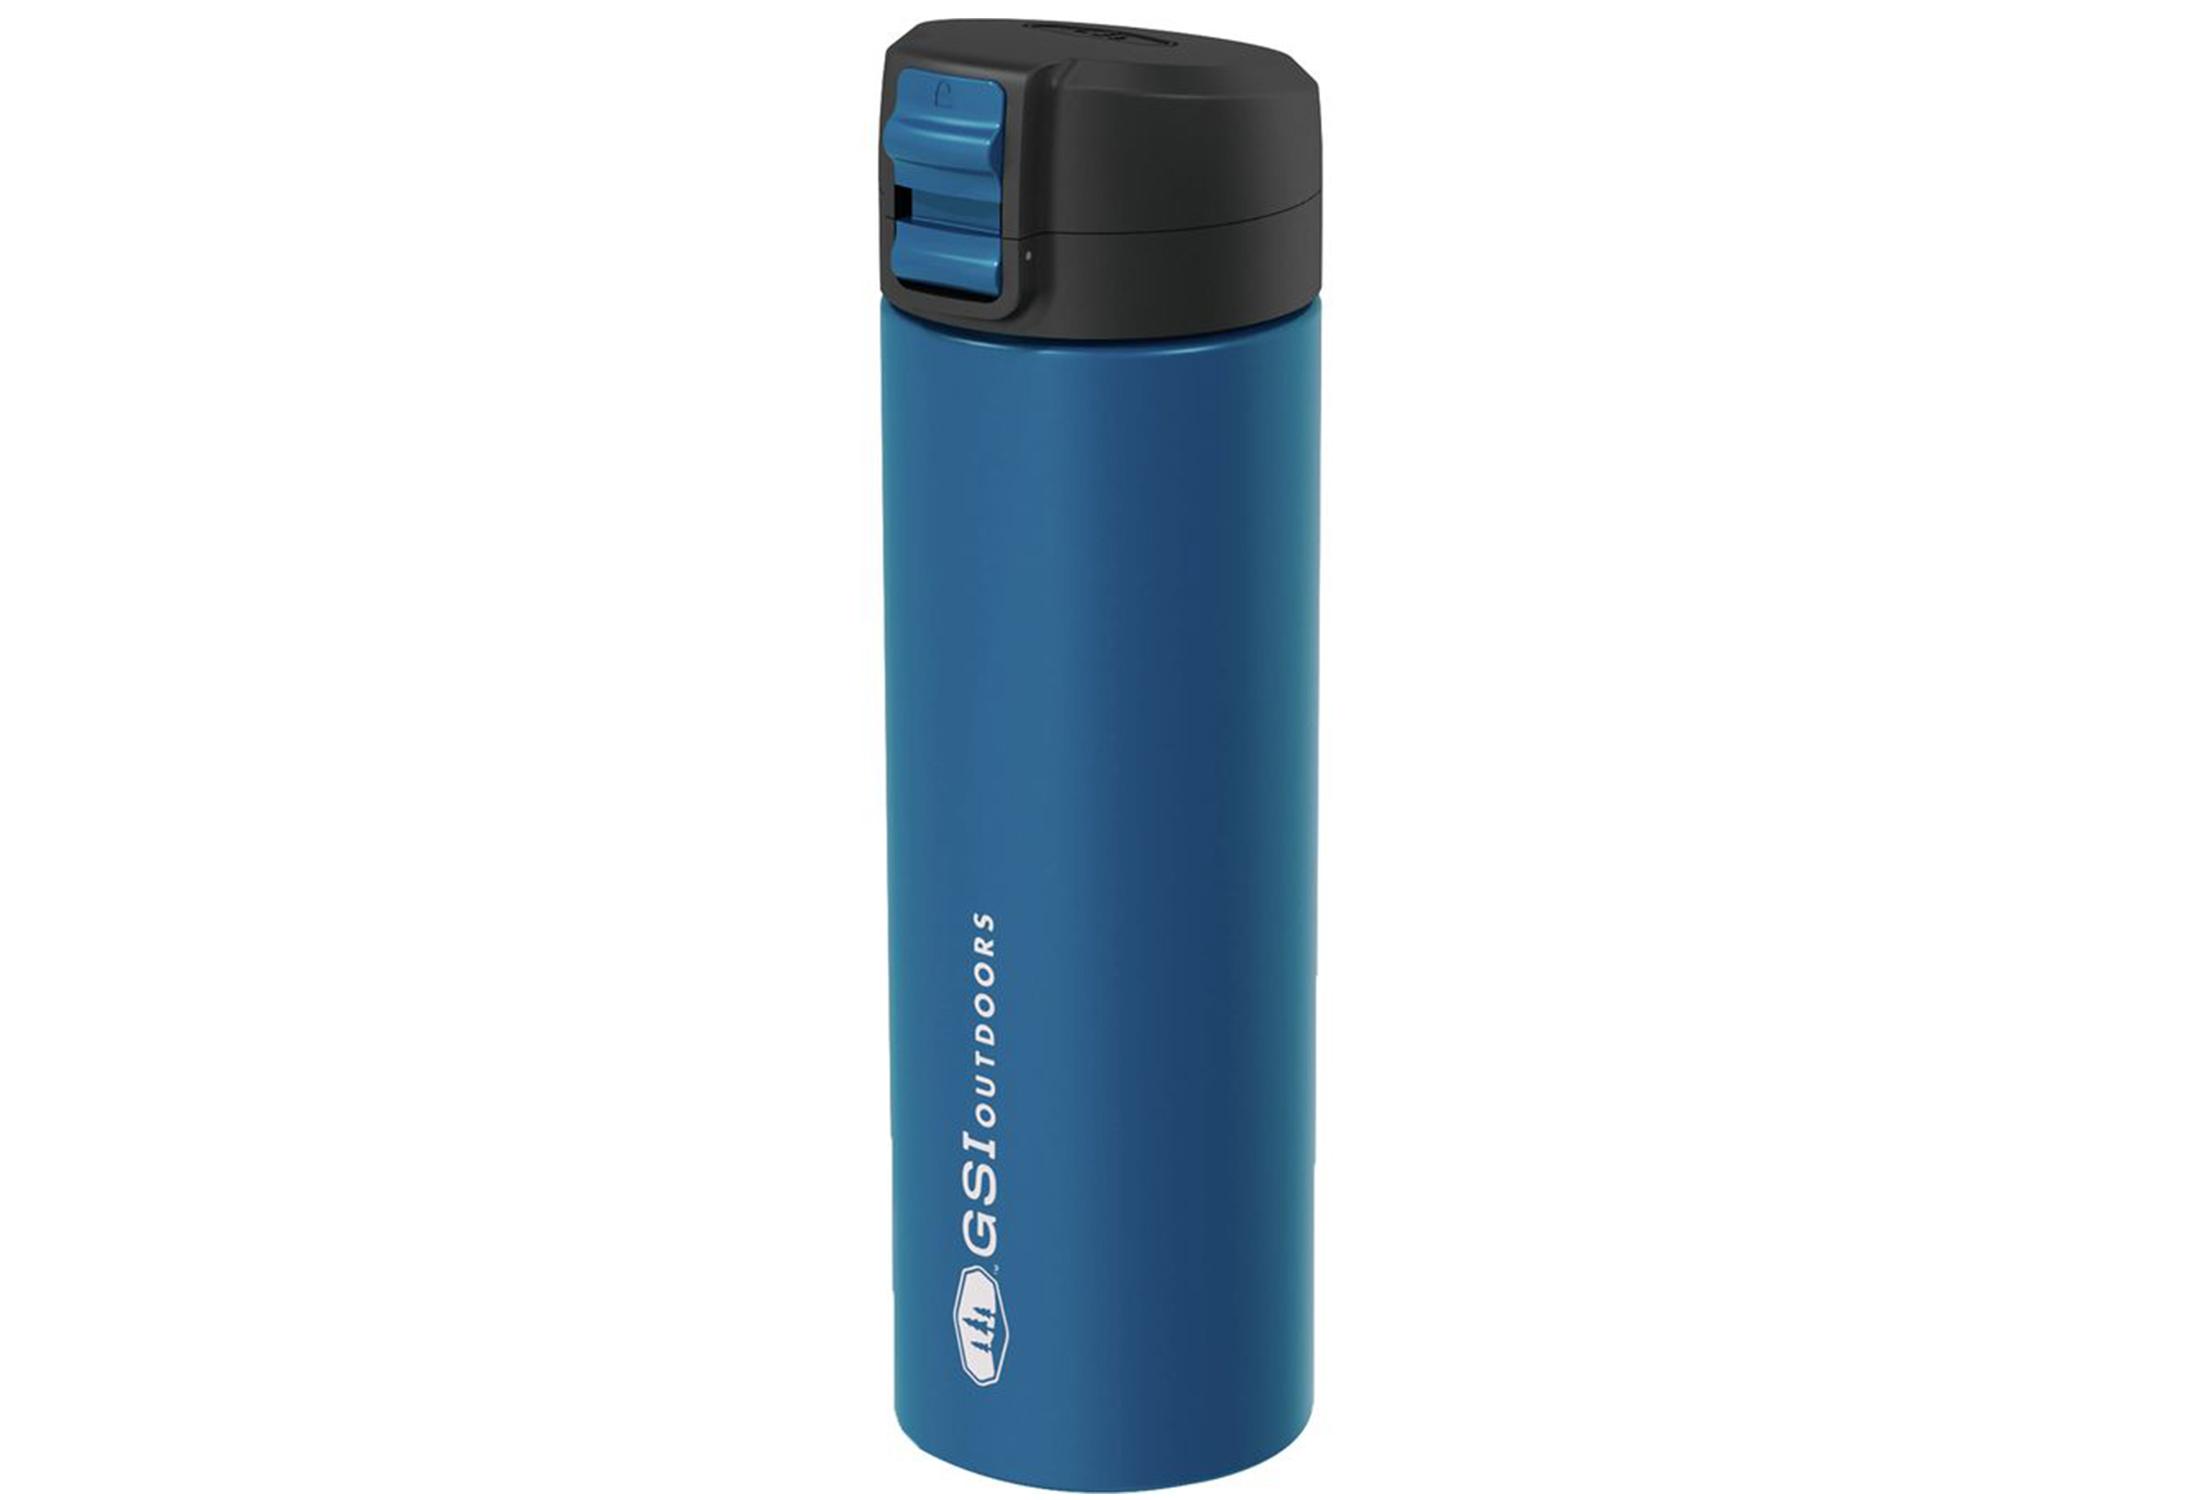 GSI outdoors 720mL water bottle